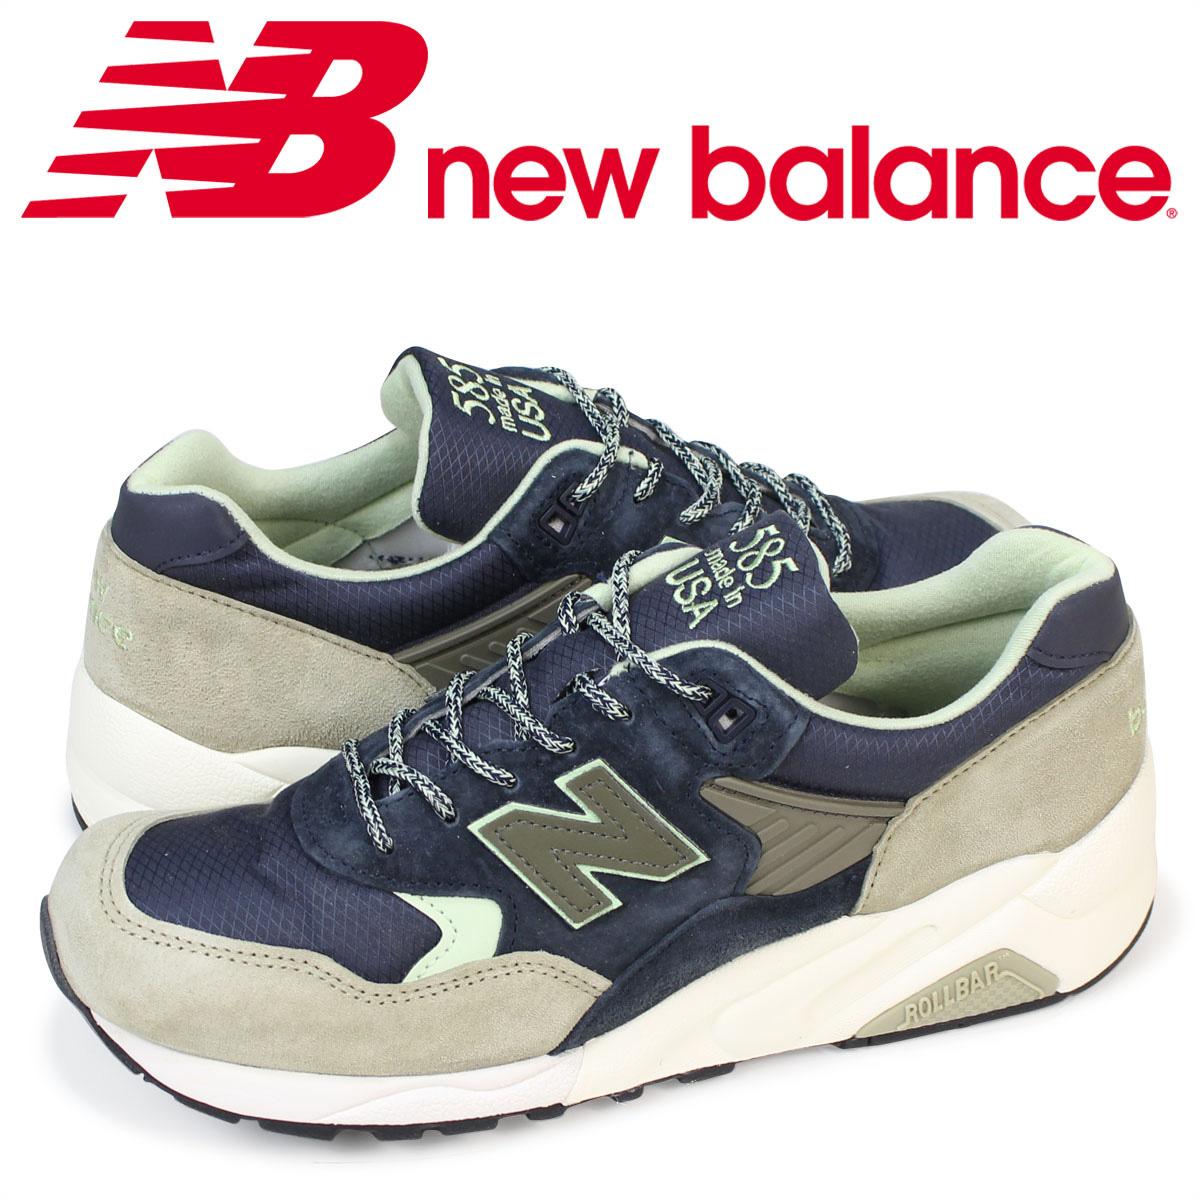 new balance 585